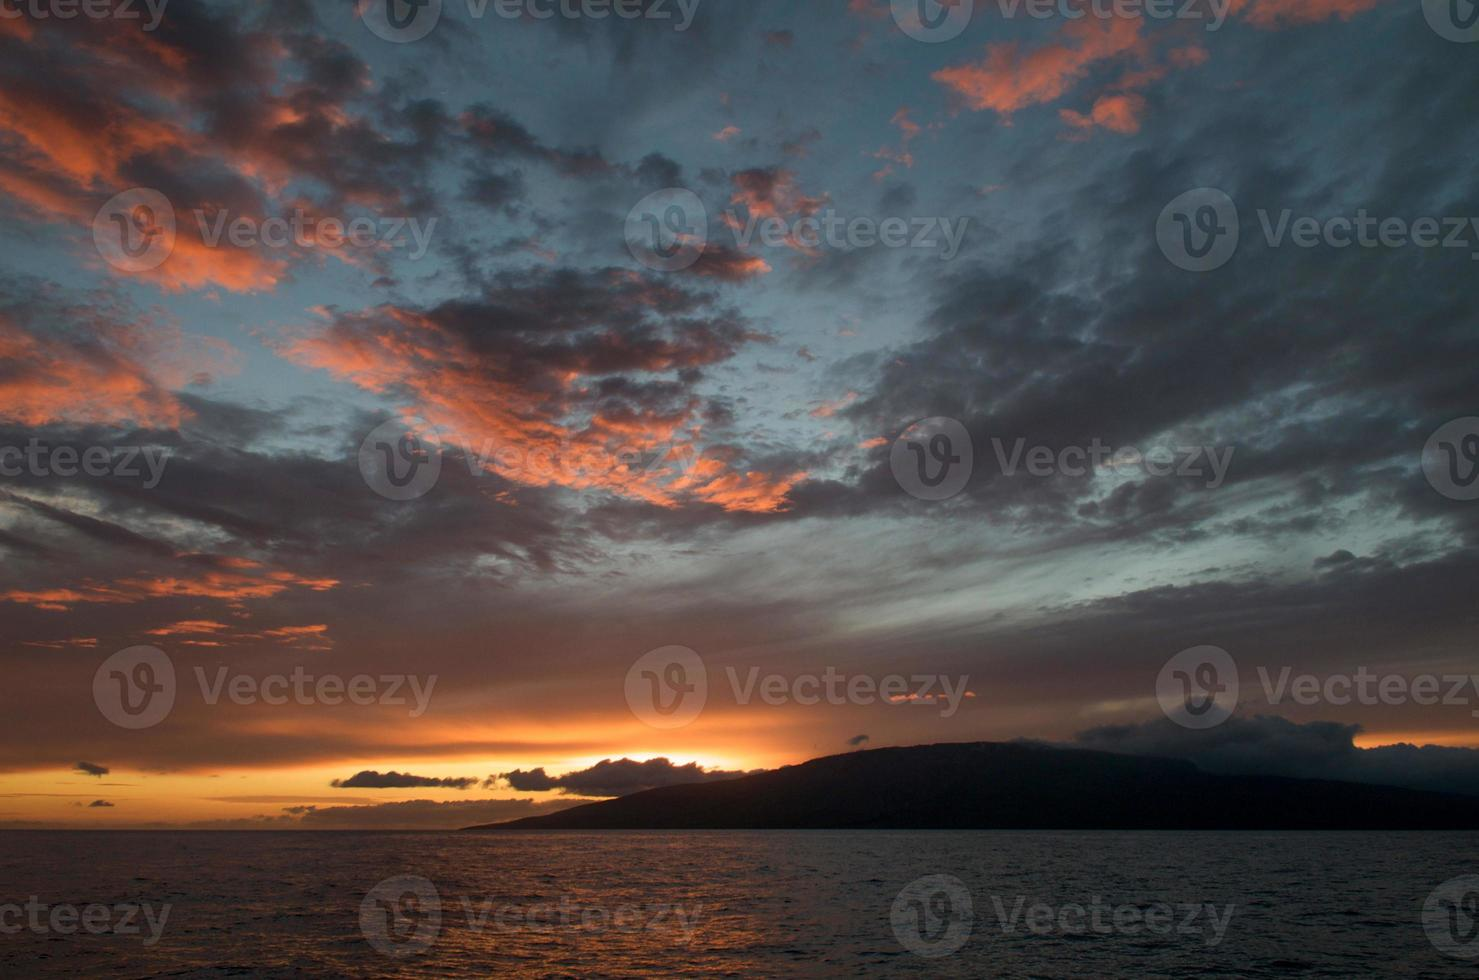 dramatische zonsondergang uit Maui, Hawaï. foto